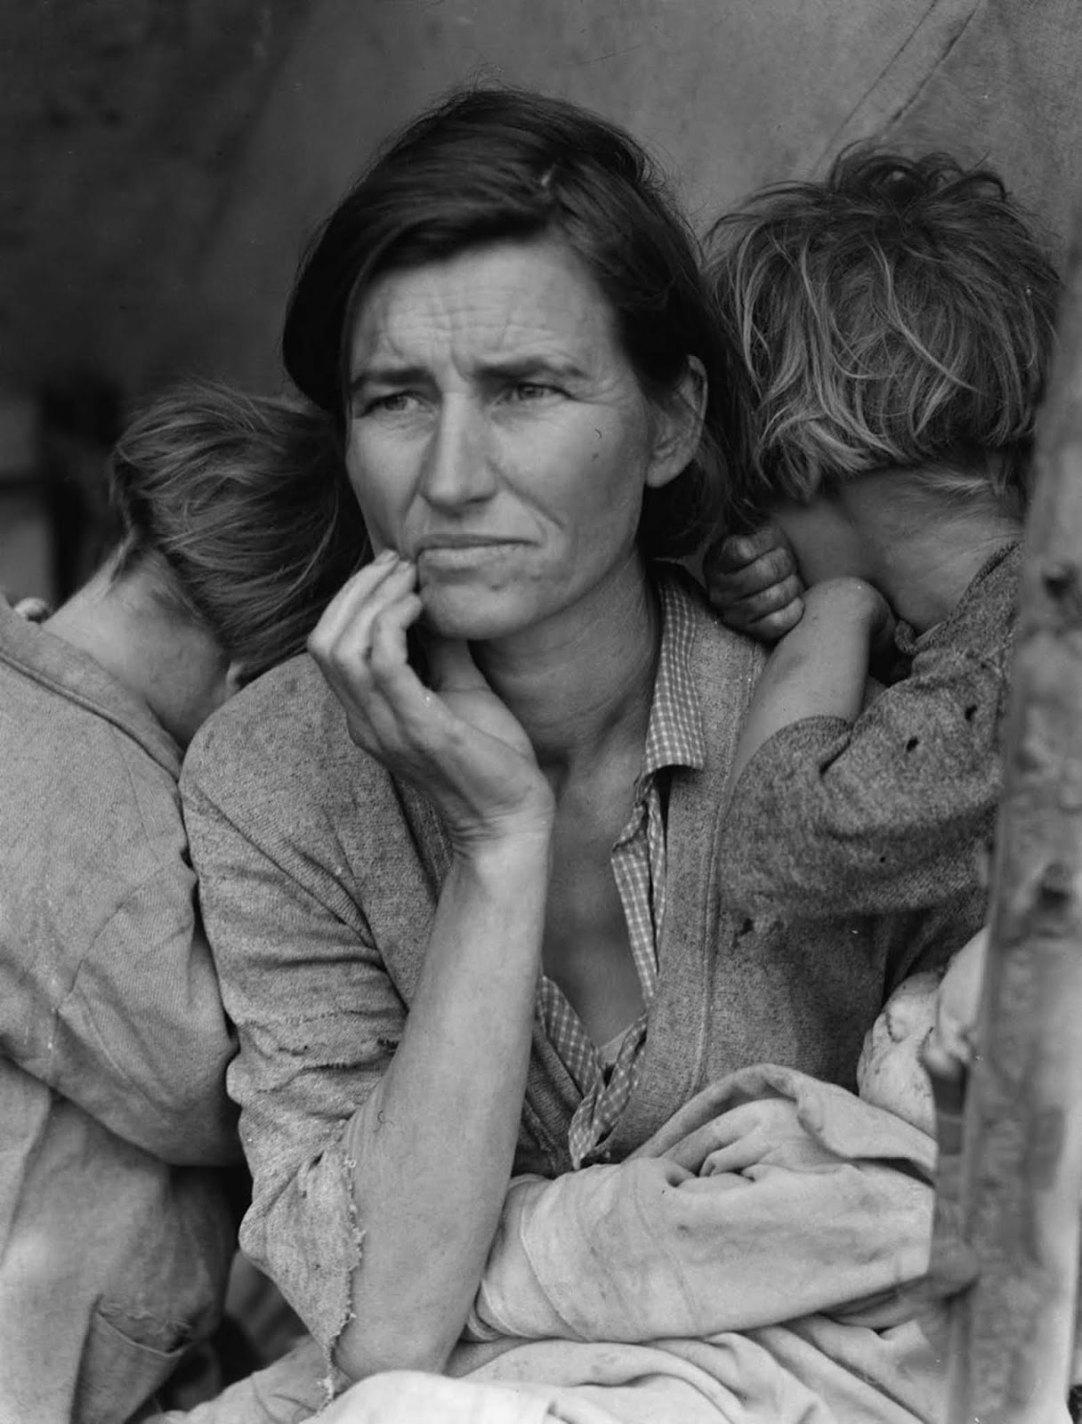 Migrant Mother, Dorothea Lange, 1936